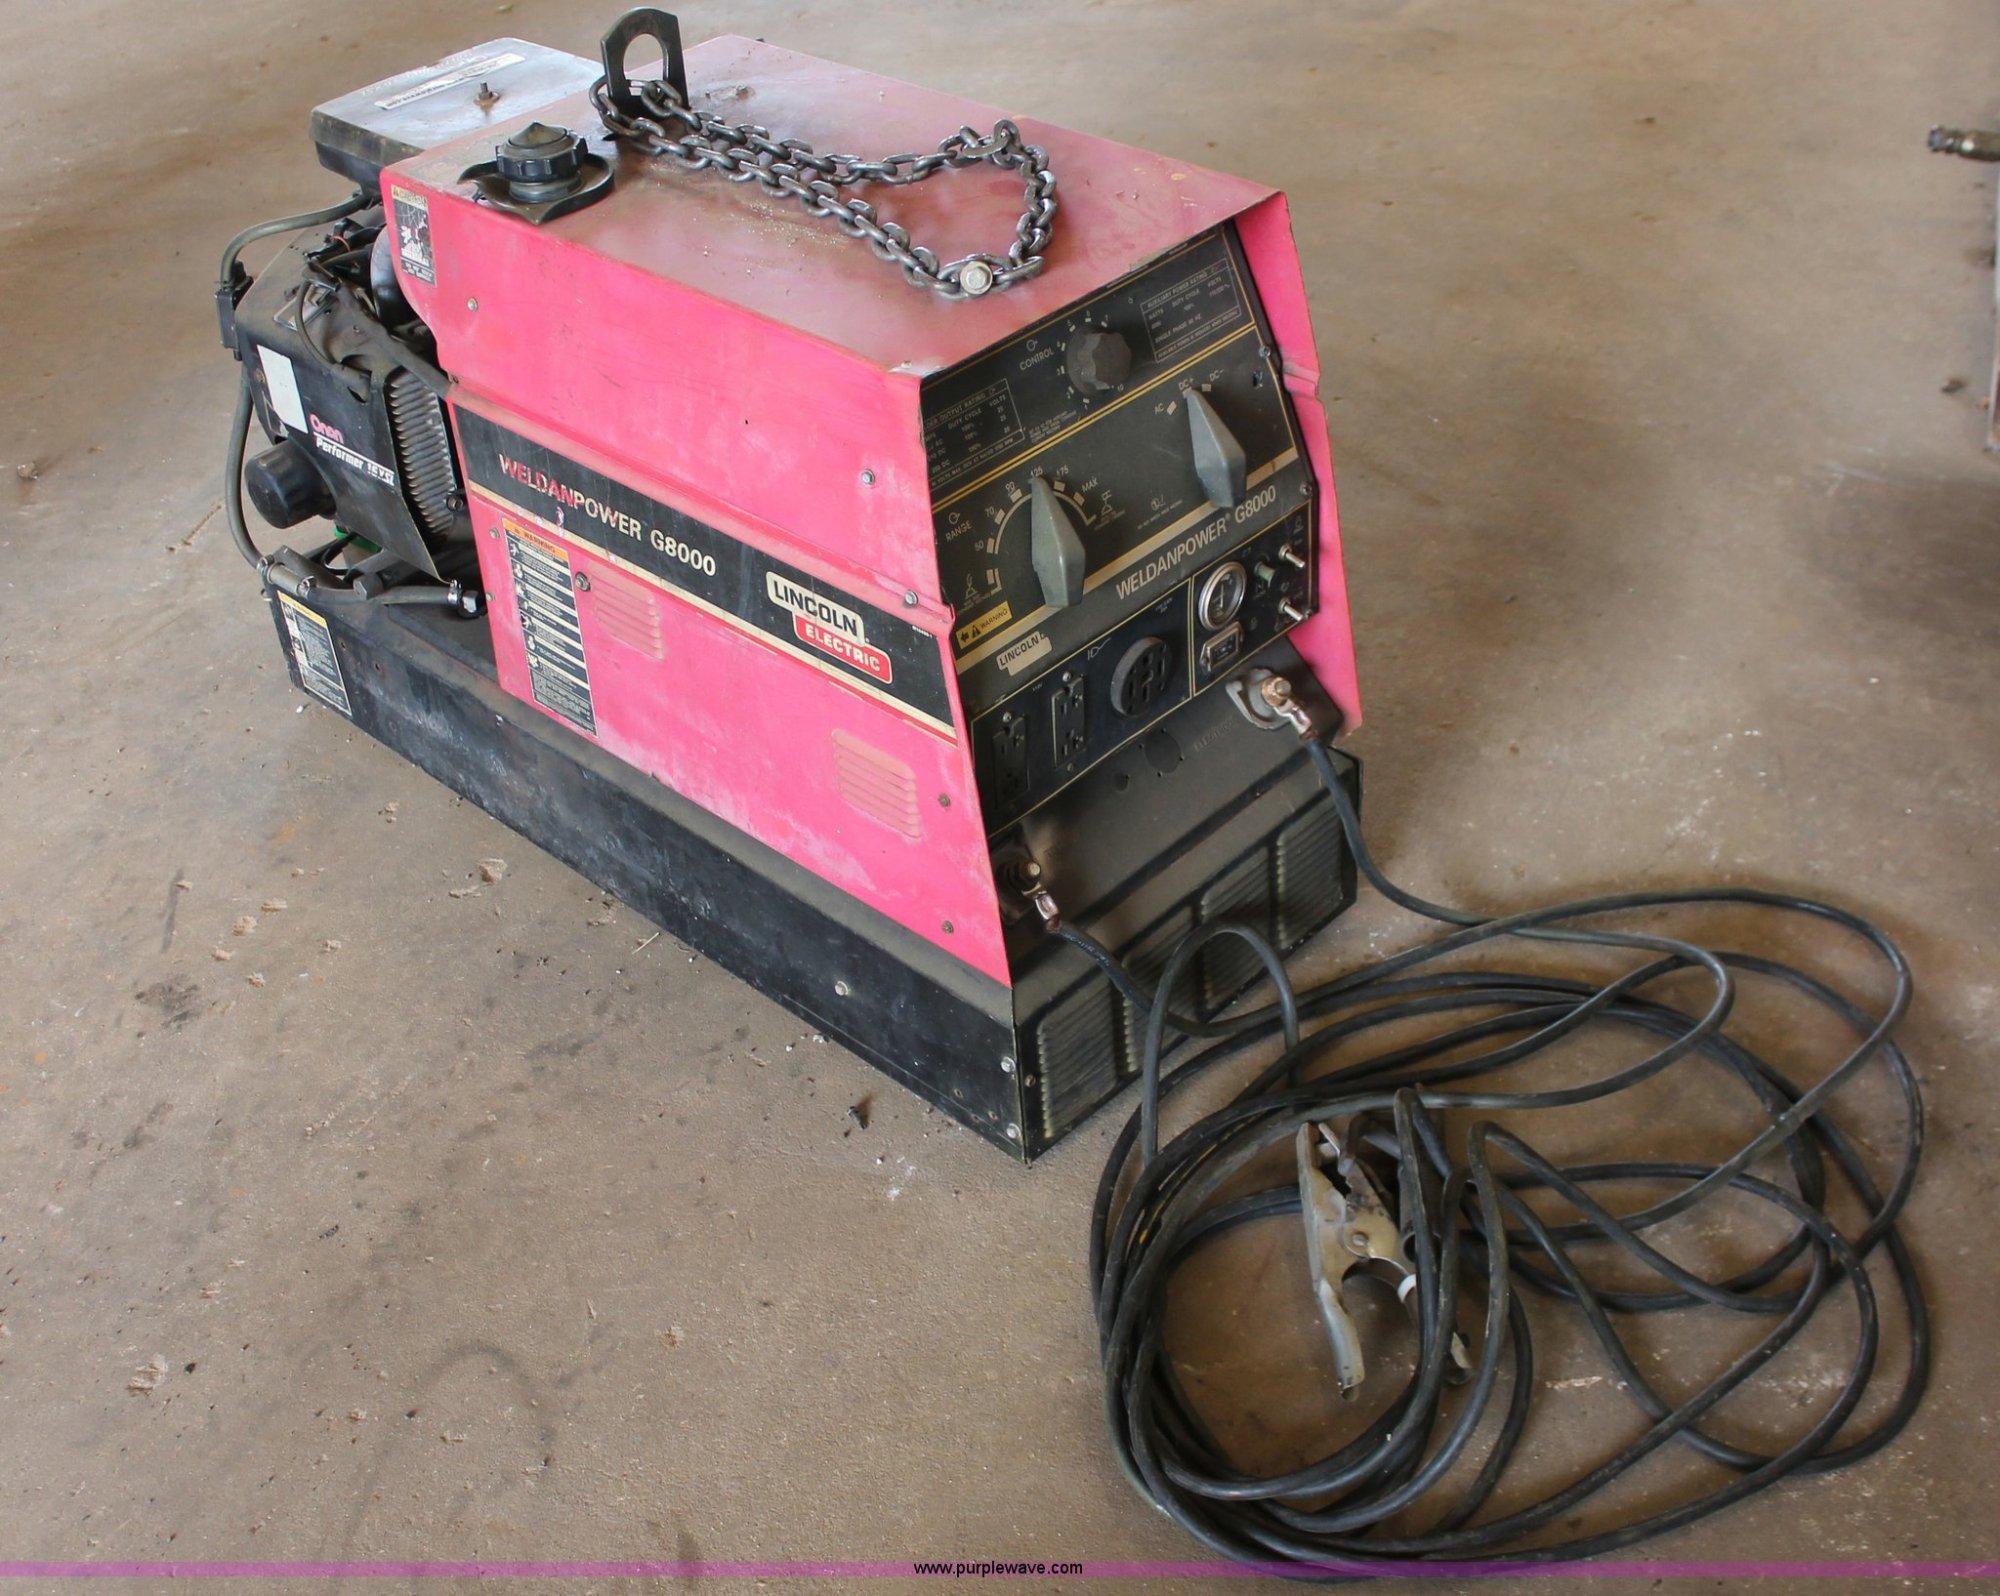 hight resolution of lincoln weldanpower g8000 welder generator item ao9456 s rh purplewave com lincoln g8000 welder generator weldanpower